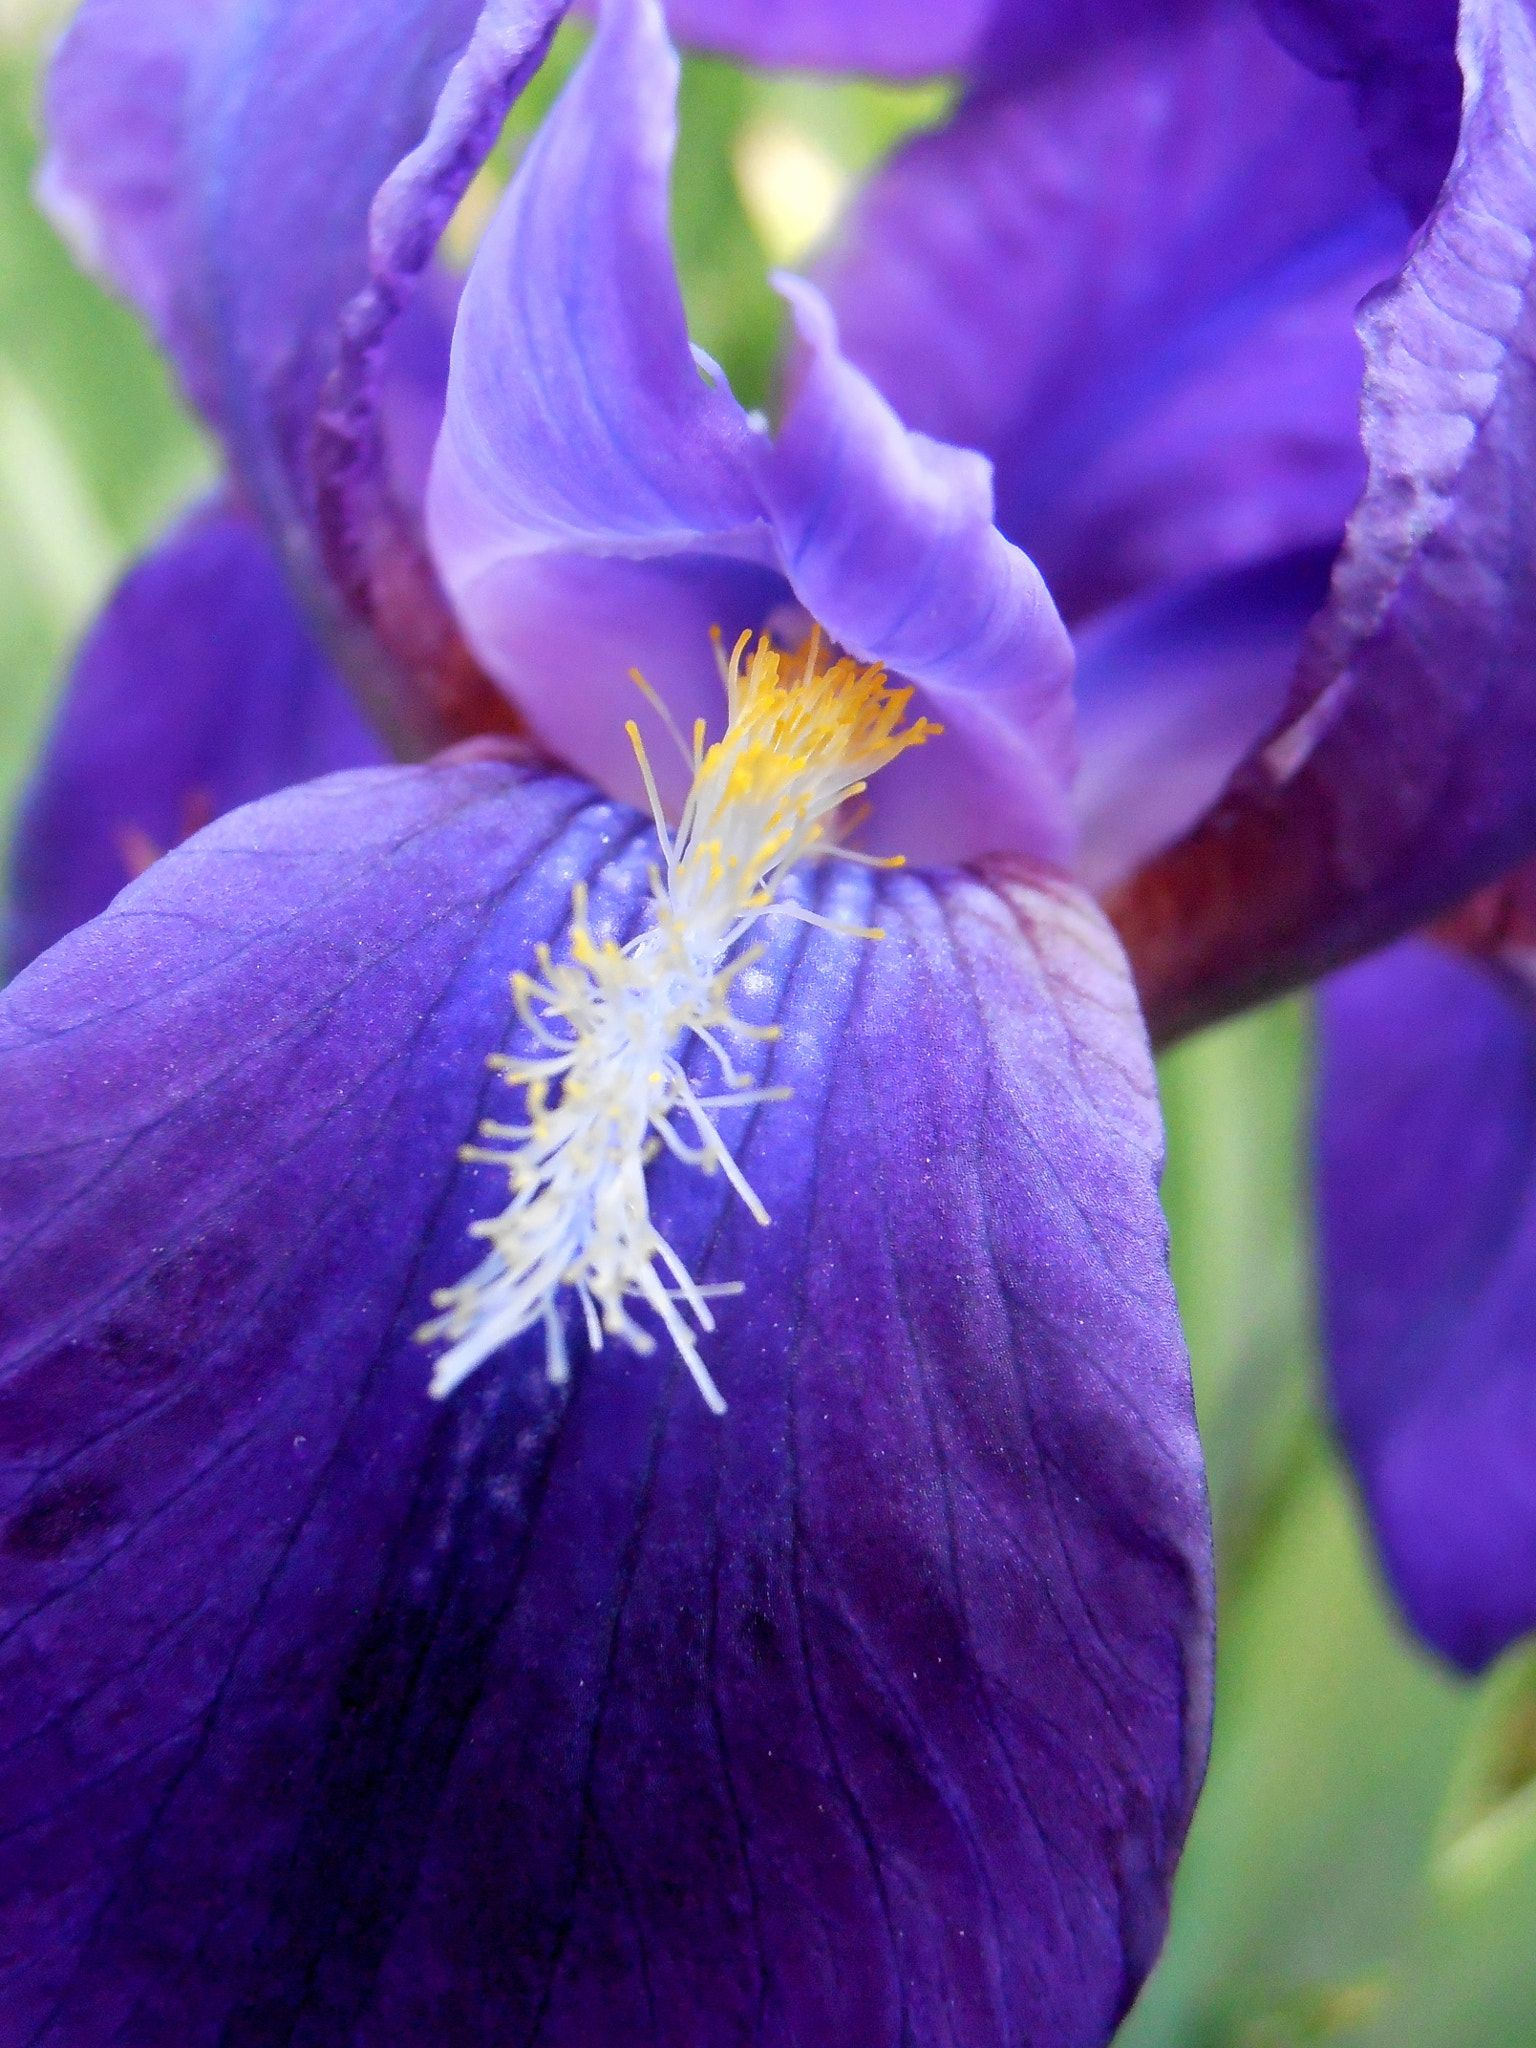 Iris Purple Iris With Yellow Stamens All Rights Reserved Snezana